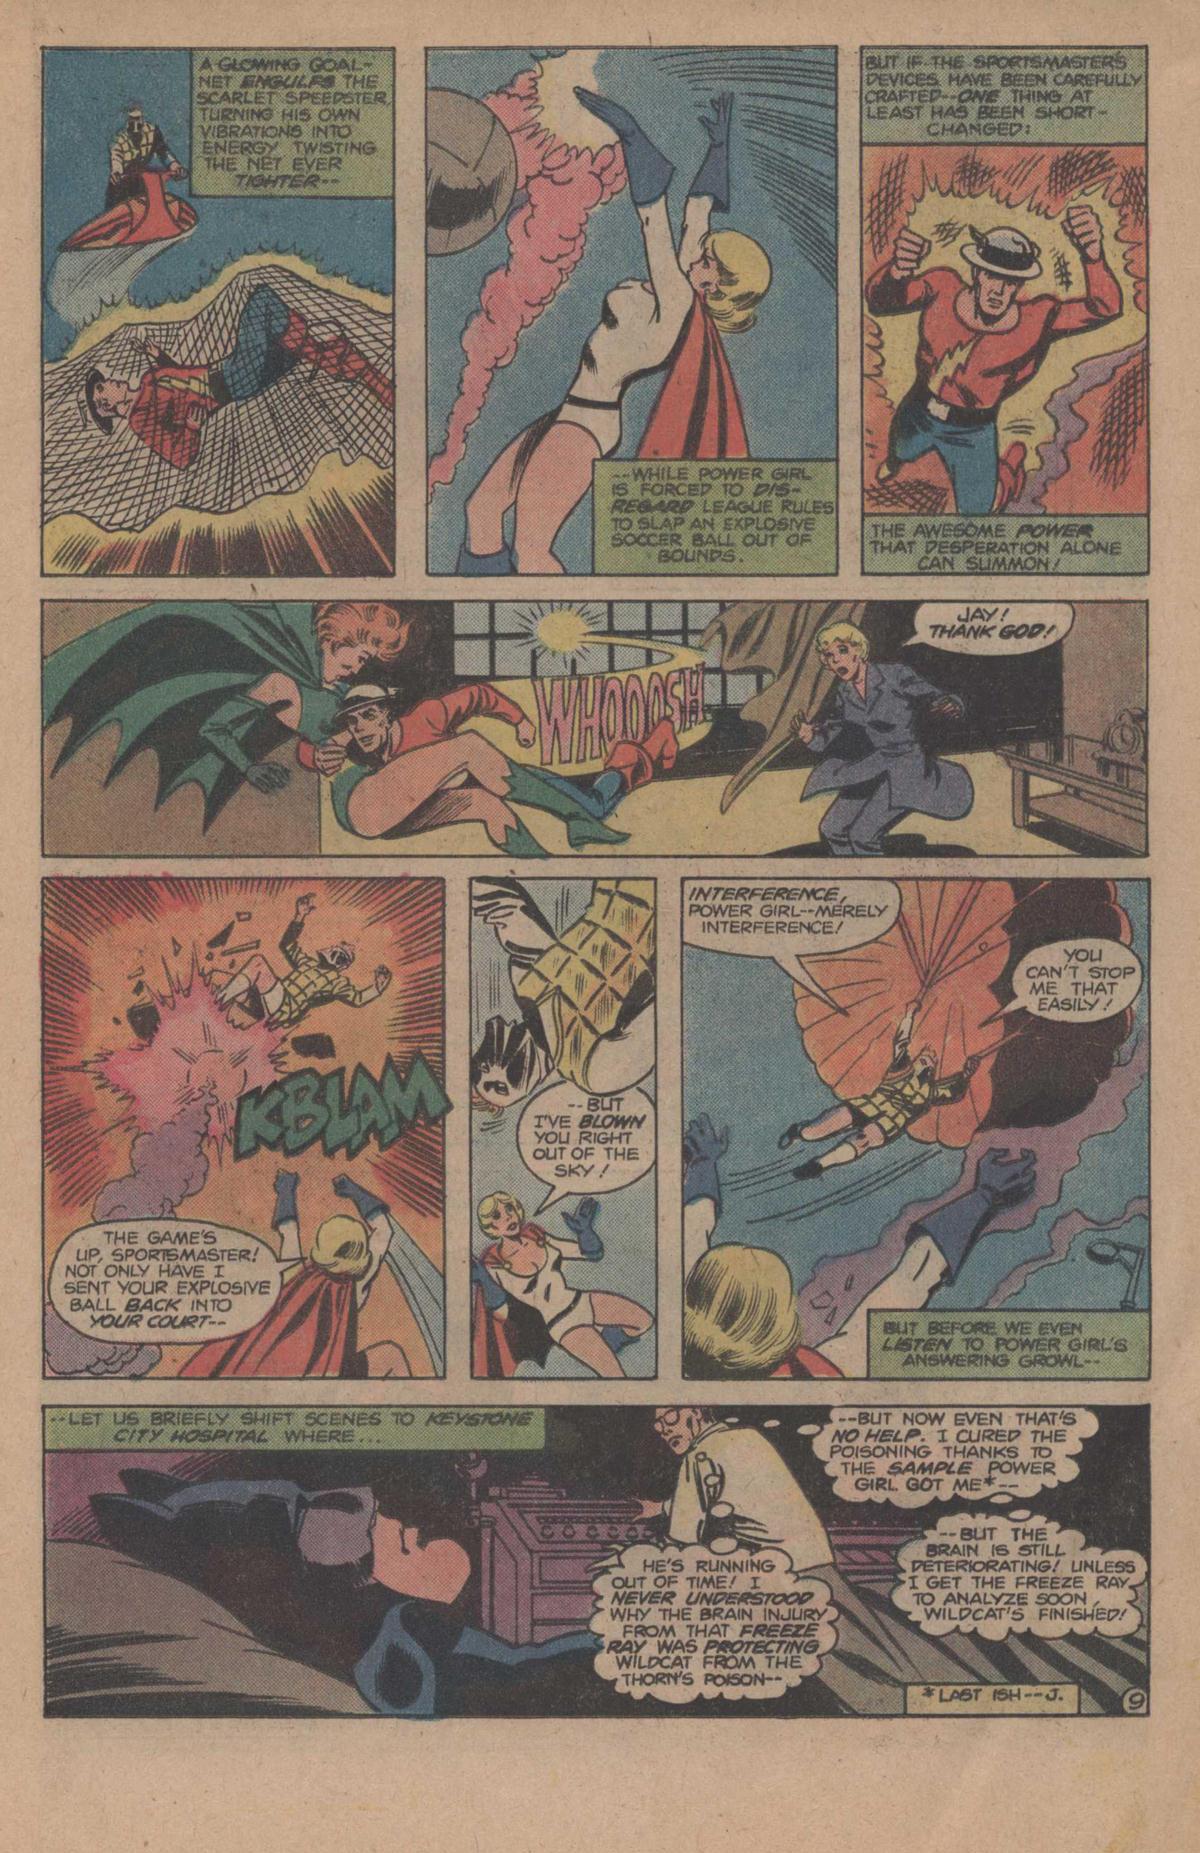 Read online All-Star Comics comic -  Issue #73 - 15